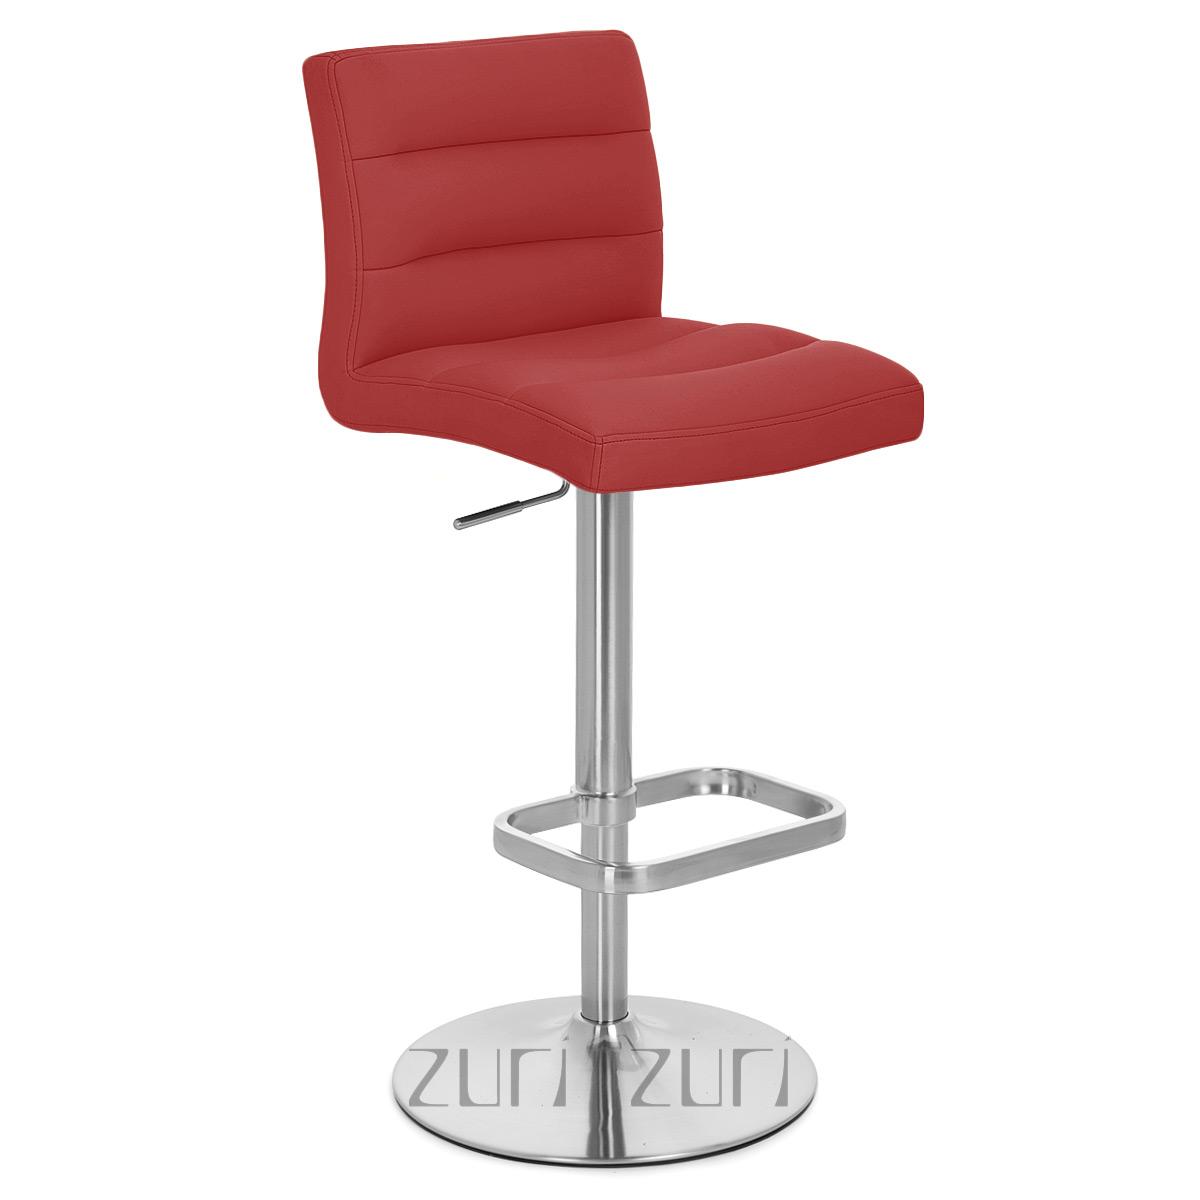 Lush Bar Stool Zuri Furniture